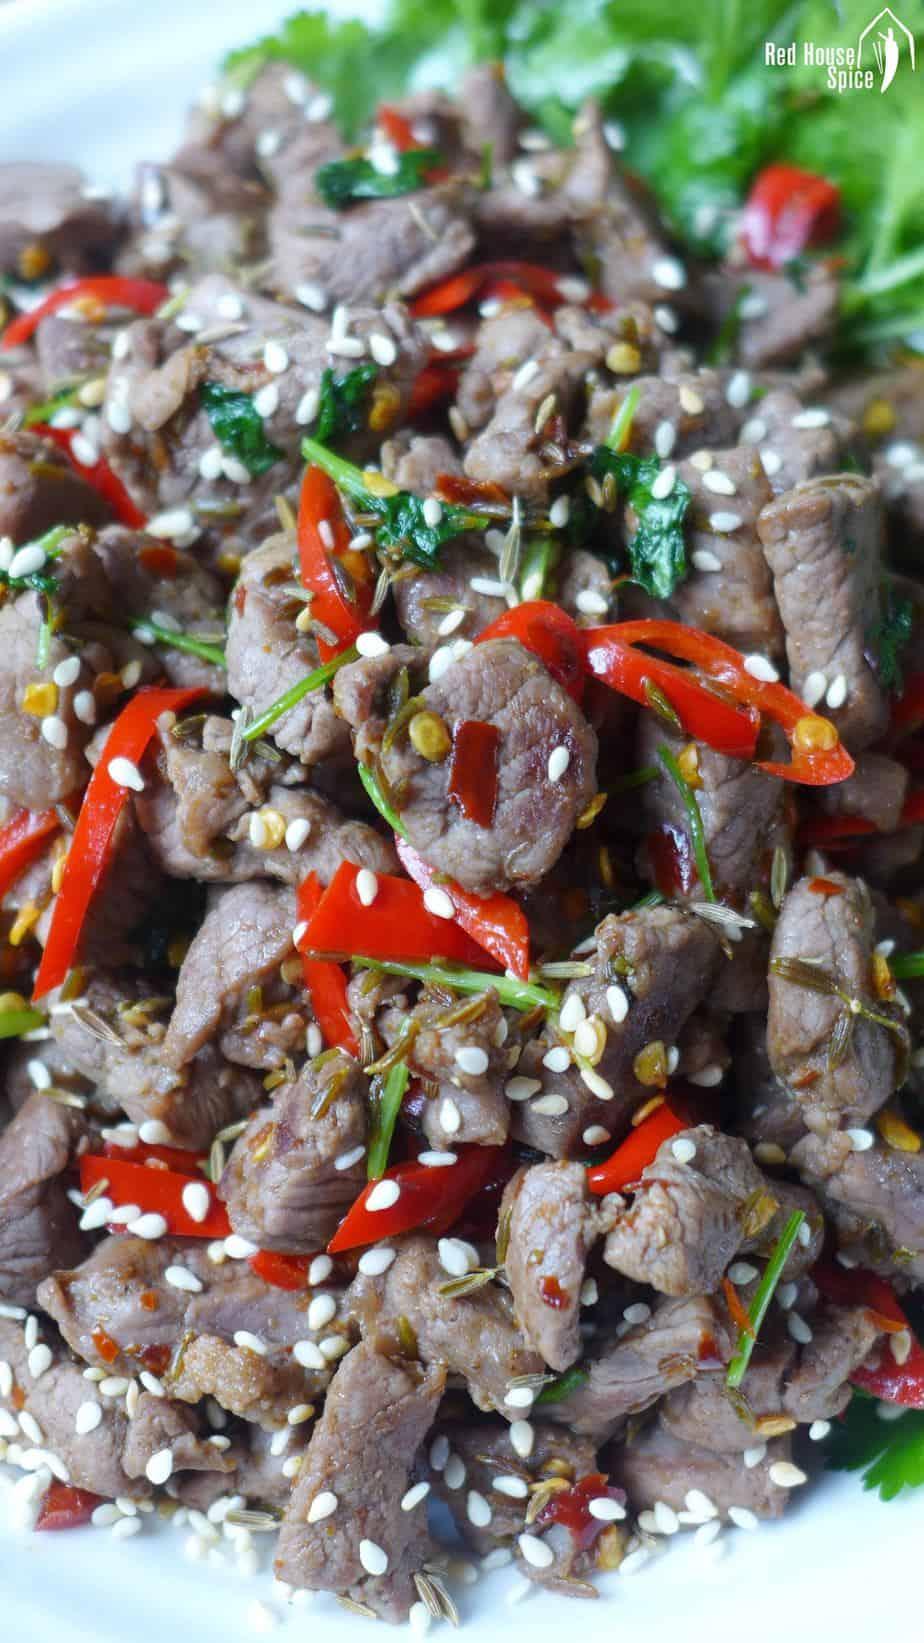 spicy cumin lamb stir-fry